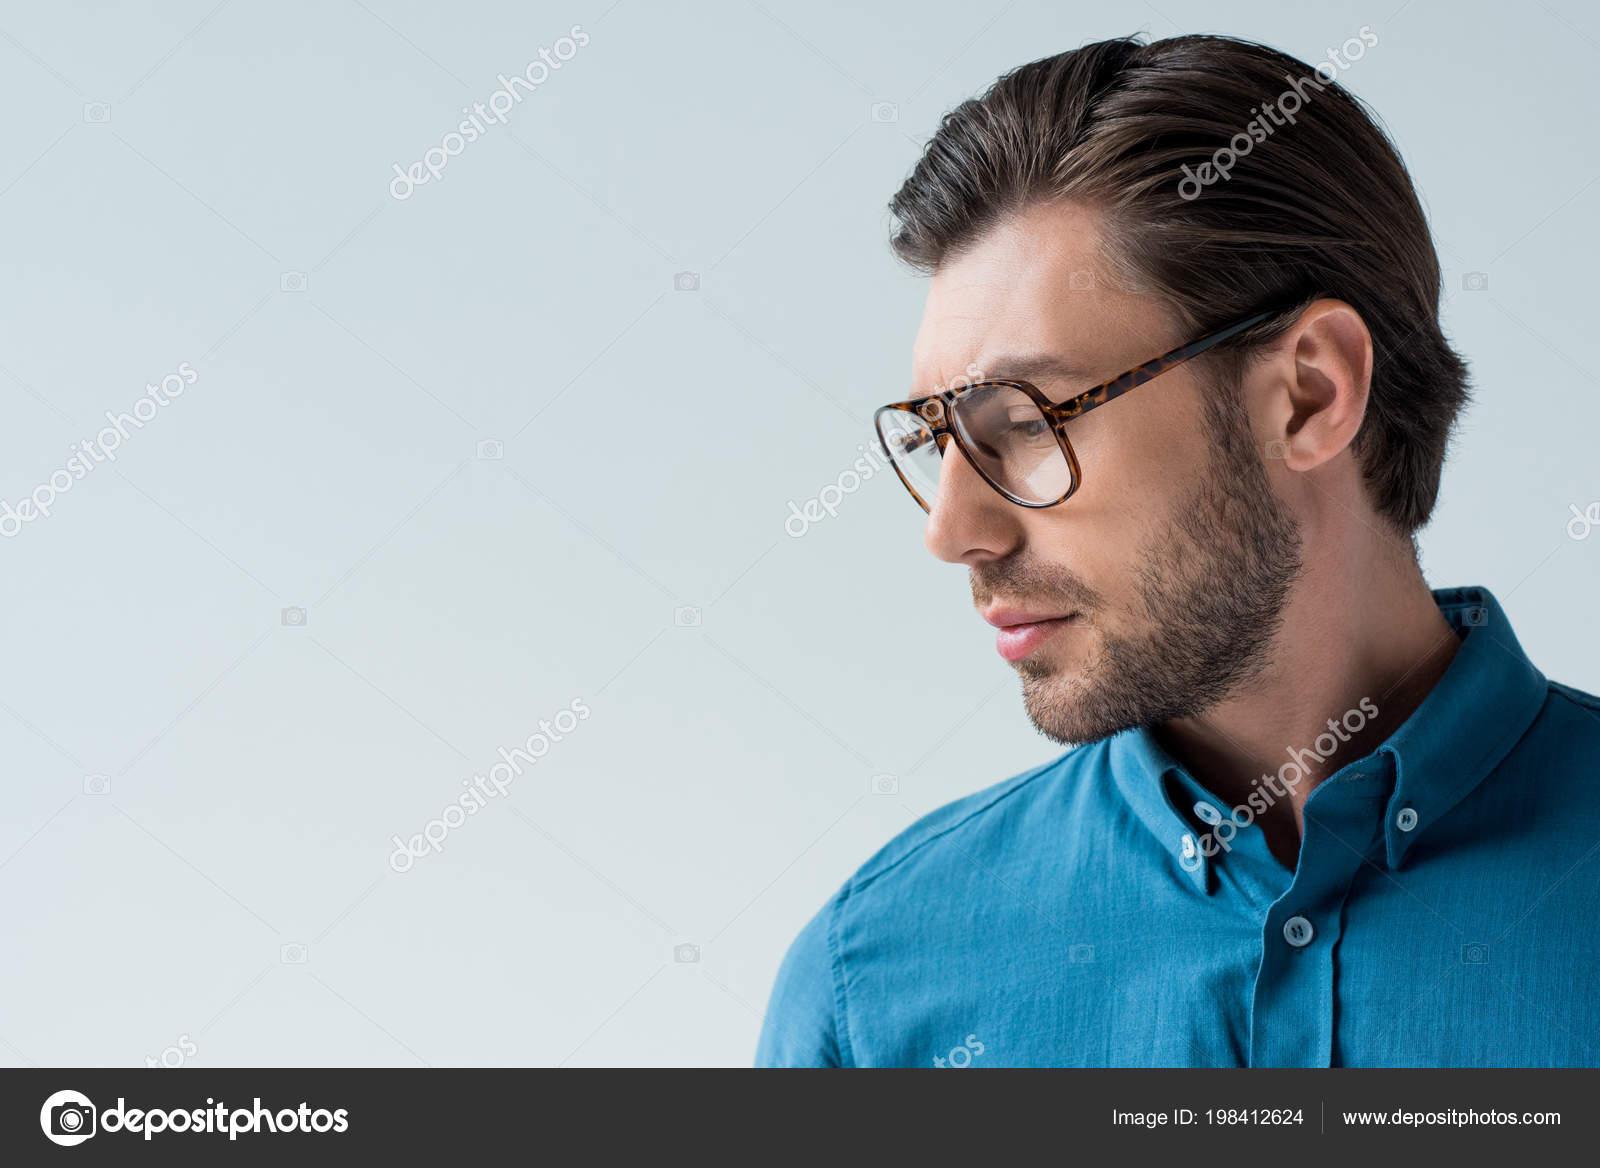 b8a967b1b5 Serious Young Man Stylish Eyeglasses Isolated White — Stock Photo ...